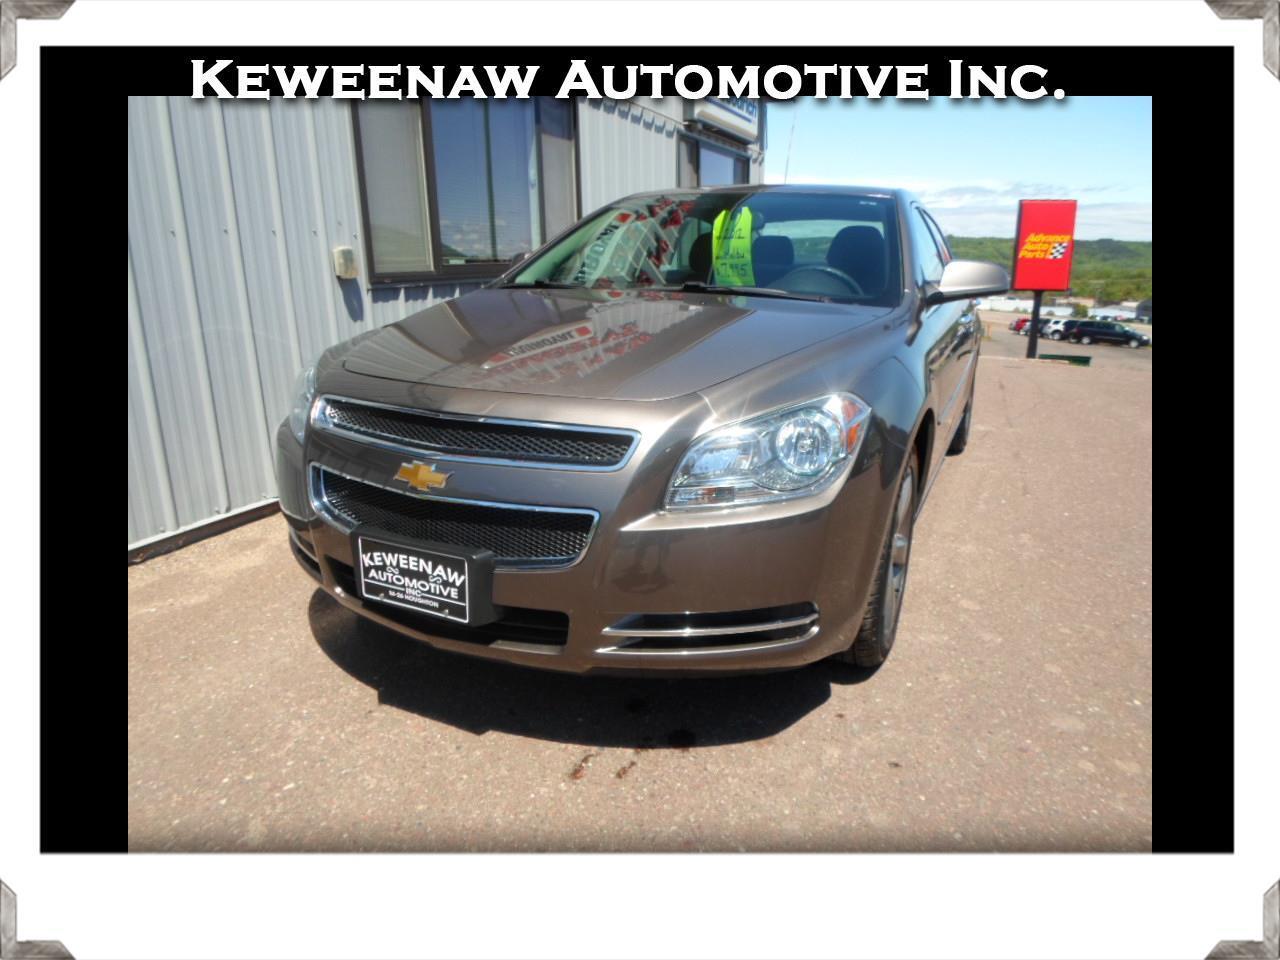 Chevrolet Malibu 4dr Sdn LT w/1LT 2012